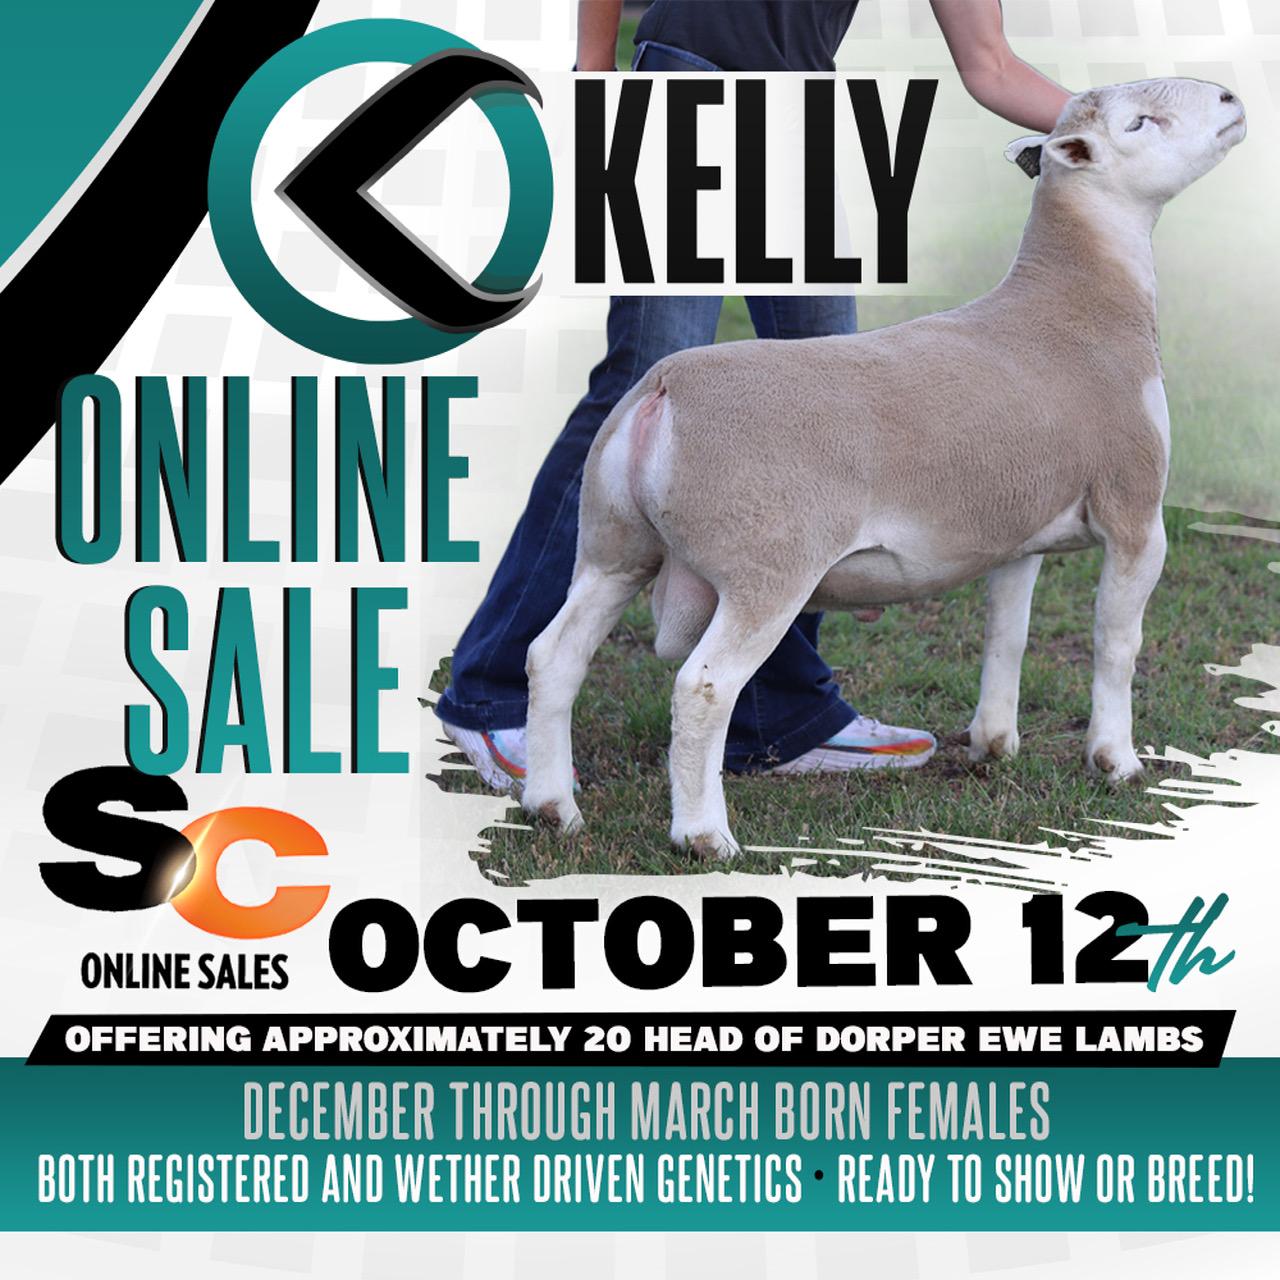 Oct. 12th Online Sale